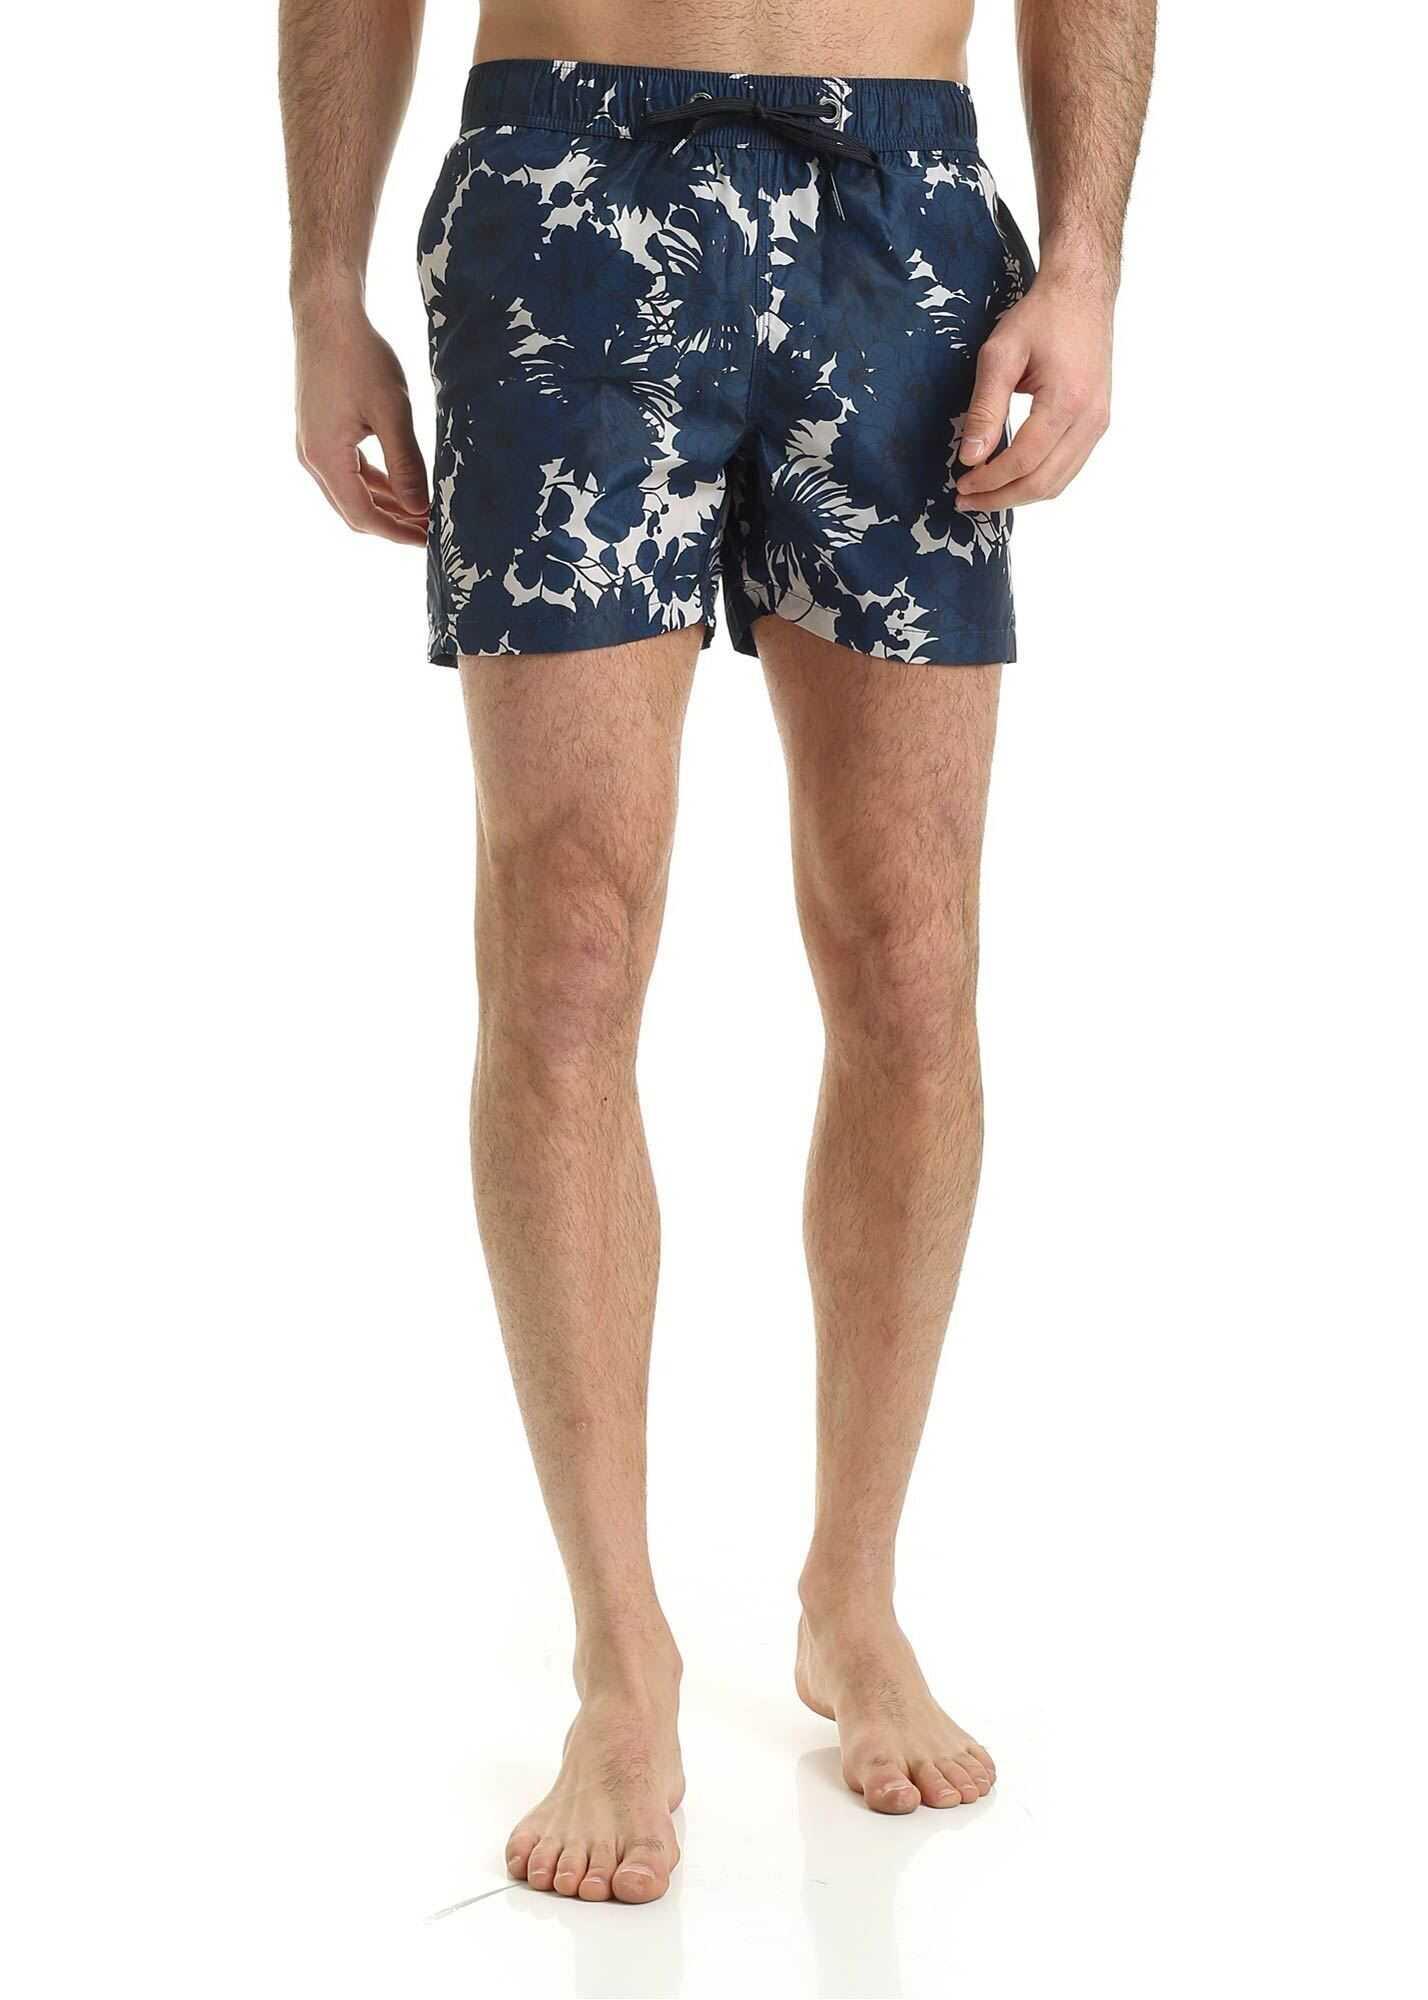 RRD Roberto Ricci Designs Tramontana Hawaii Swimsuit In Blue Blue